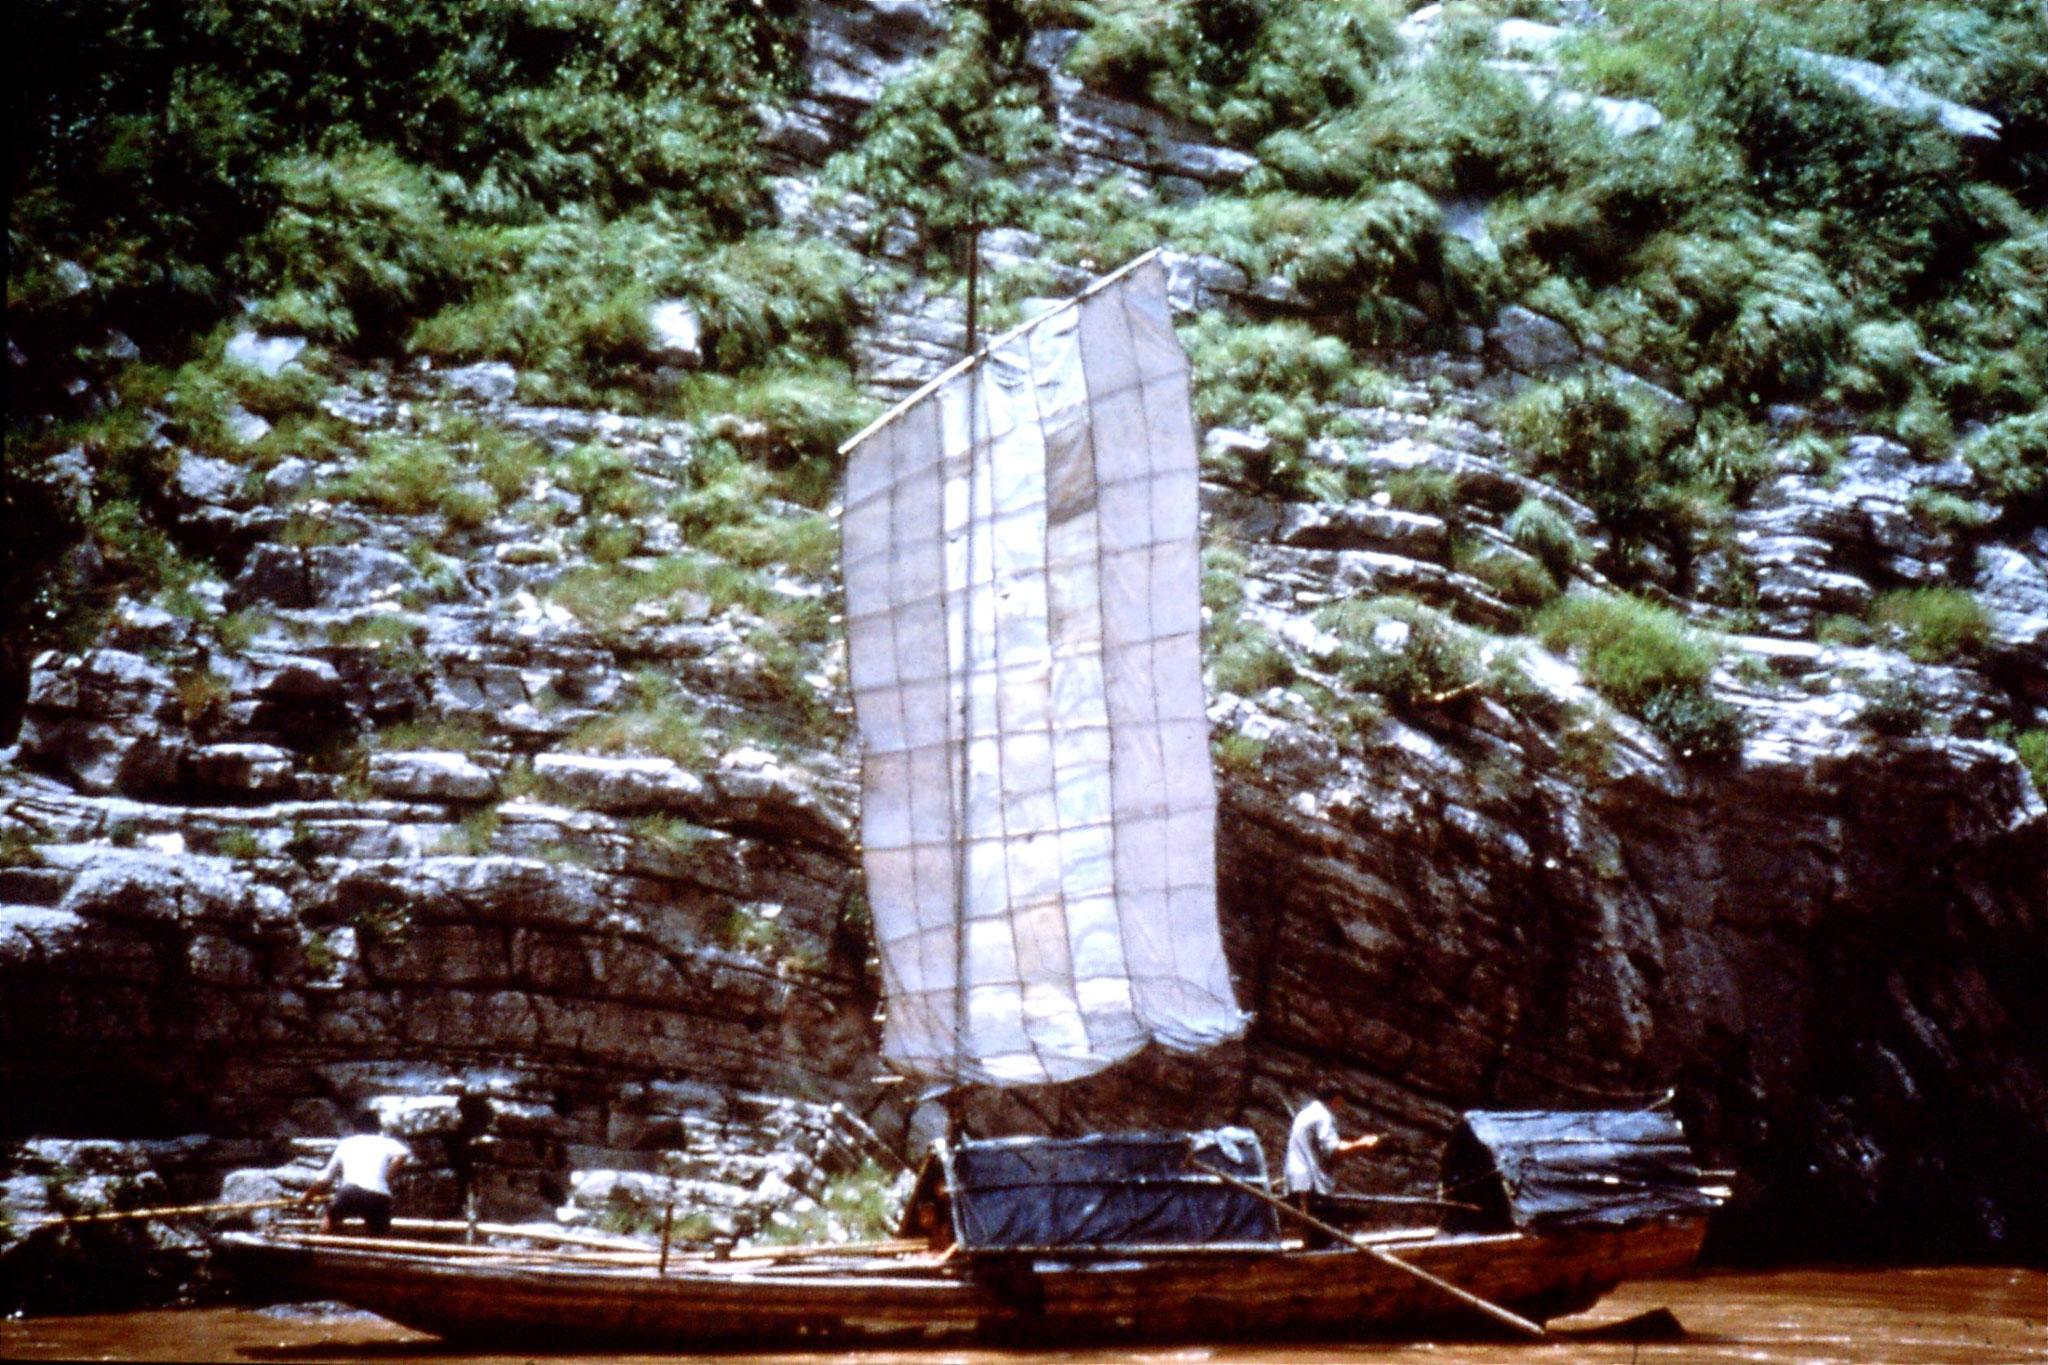 10/8/1989:27:Yangtse River, Xiling Xia (1st gorge)